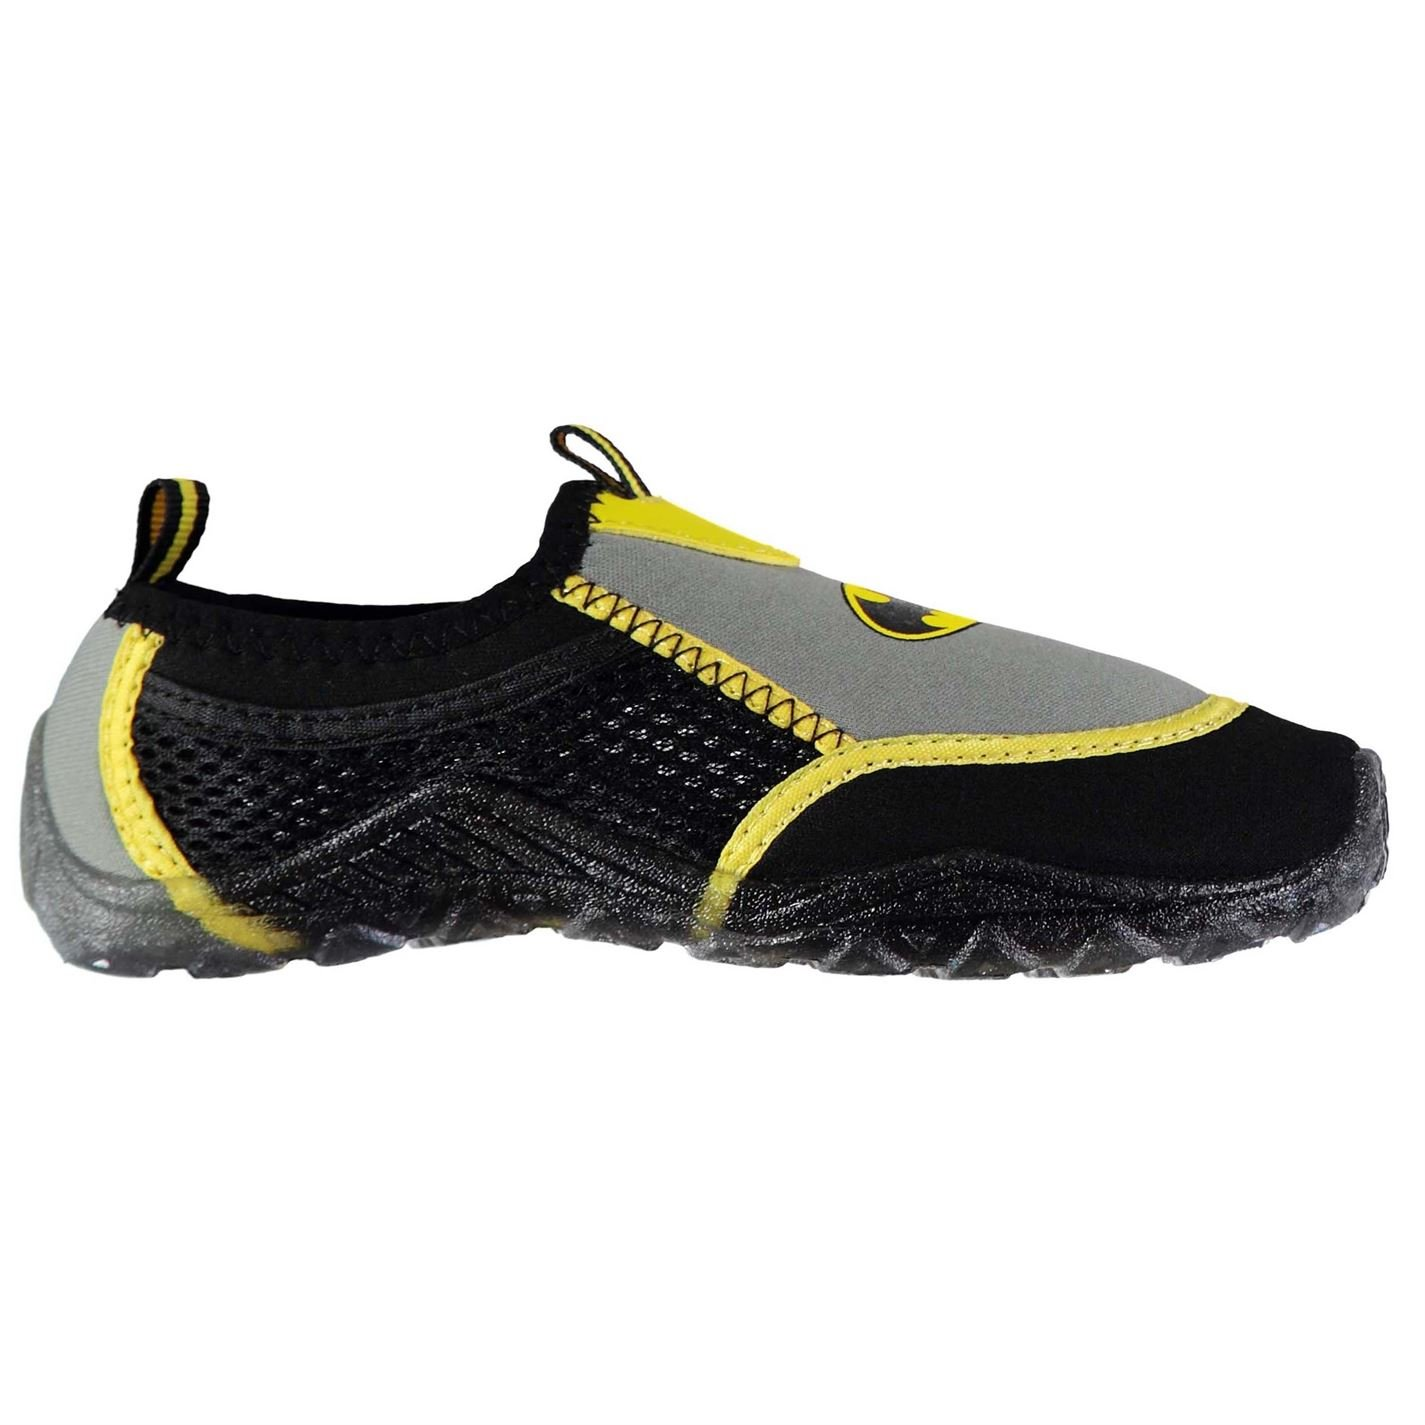 Character Kids Aqua Splasher Shoes Slip On Water Sports Pull Toggle Summer Batman UK C9 (27)